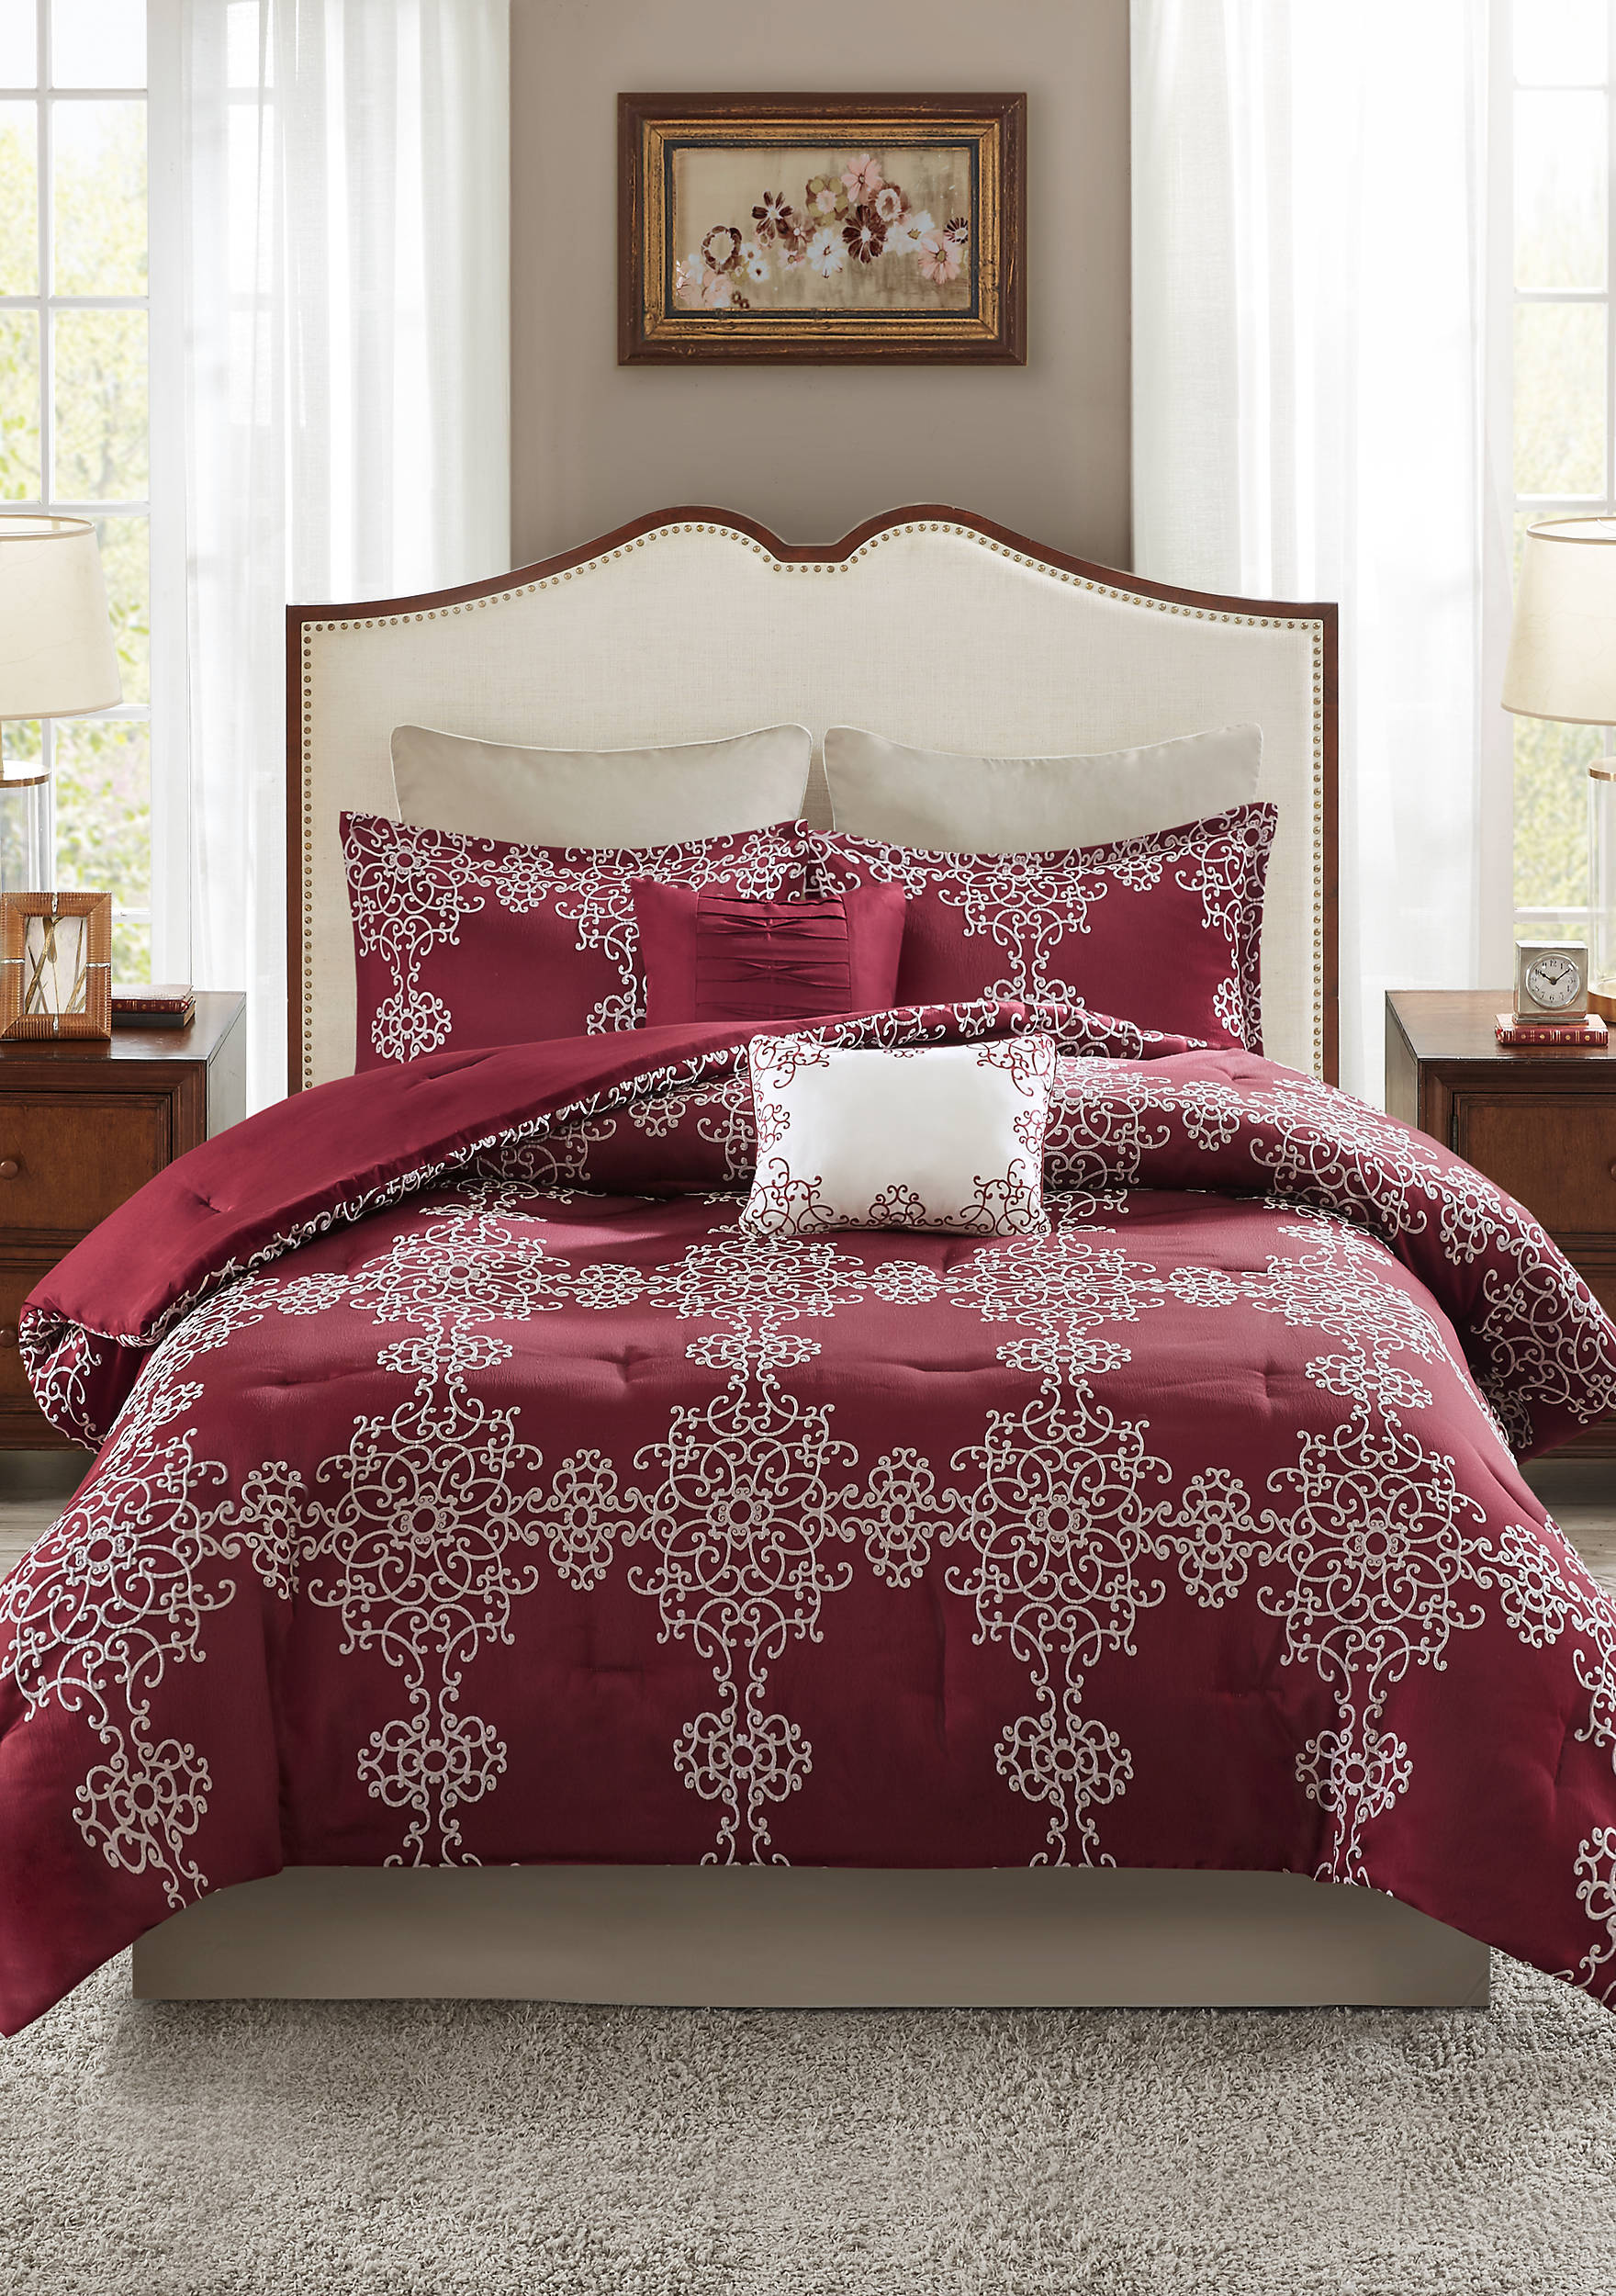 Astoria 8-Piece Bed-In-A-Bag